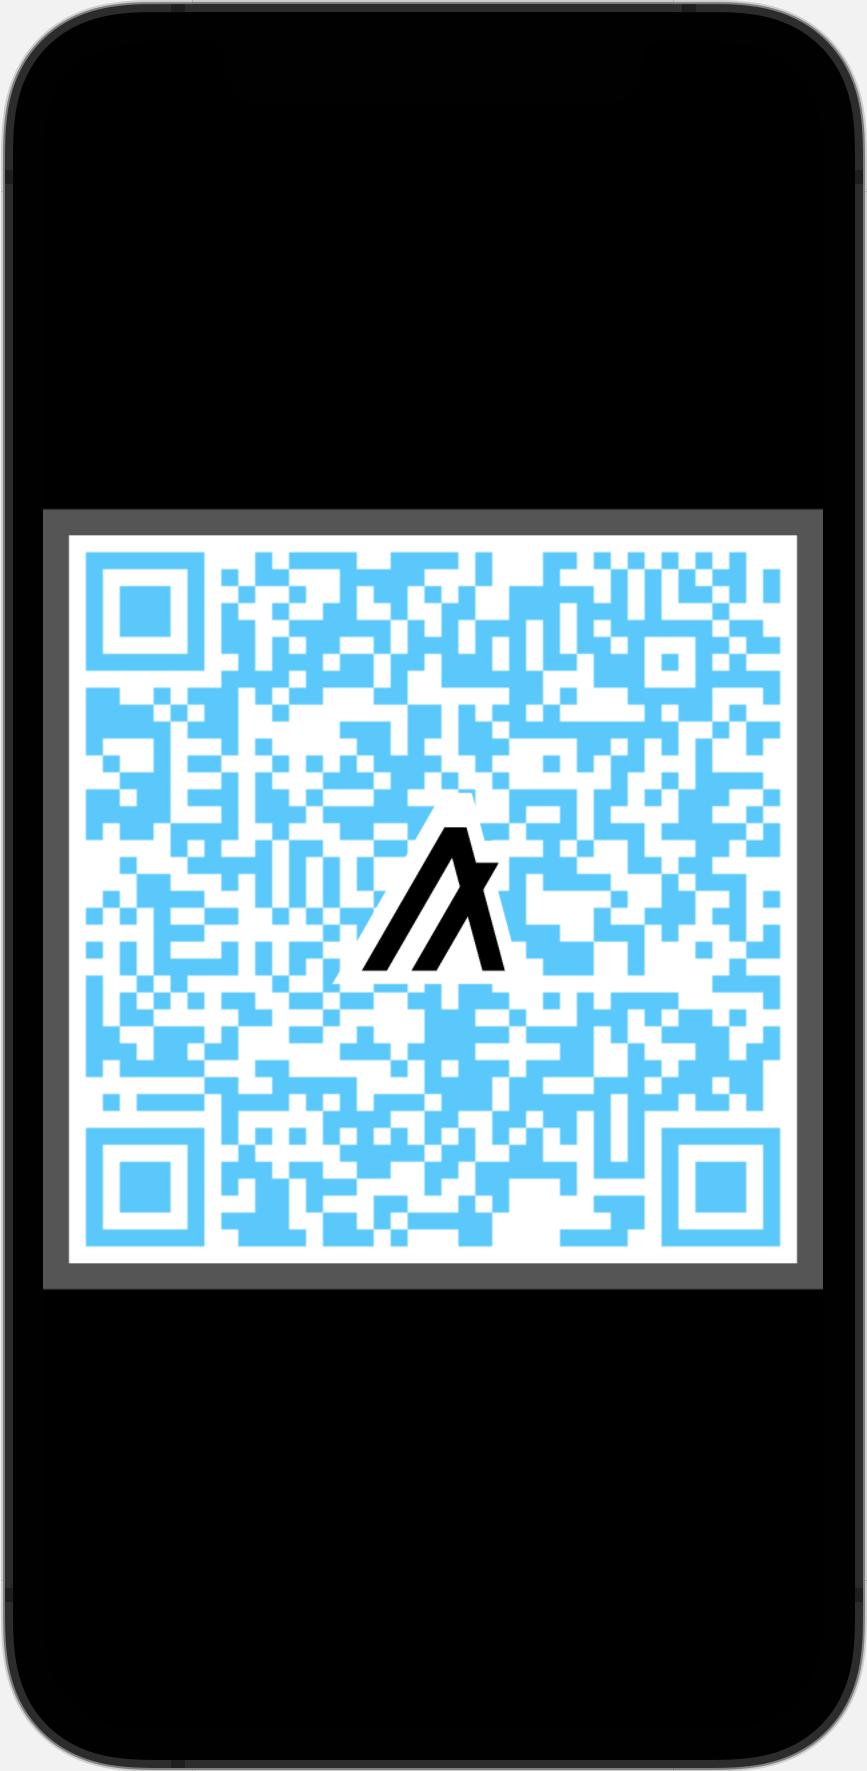 Sample Algorand QR Code 1